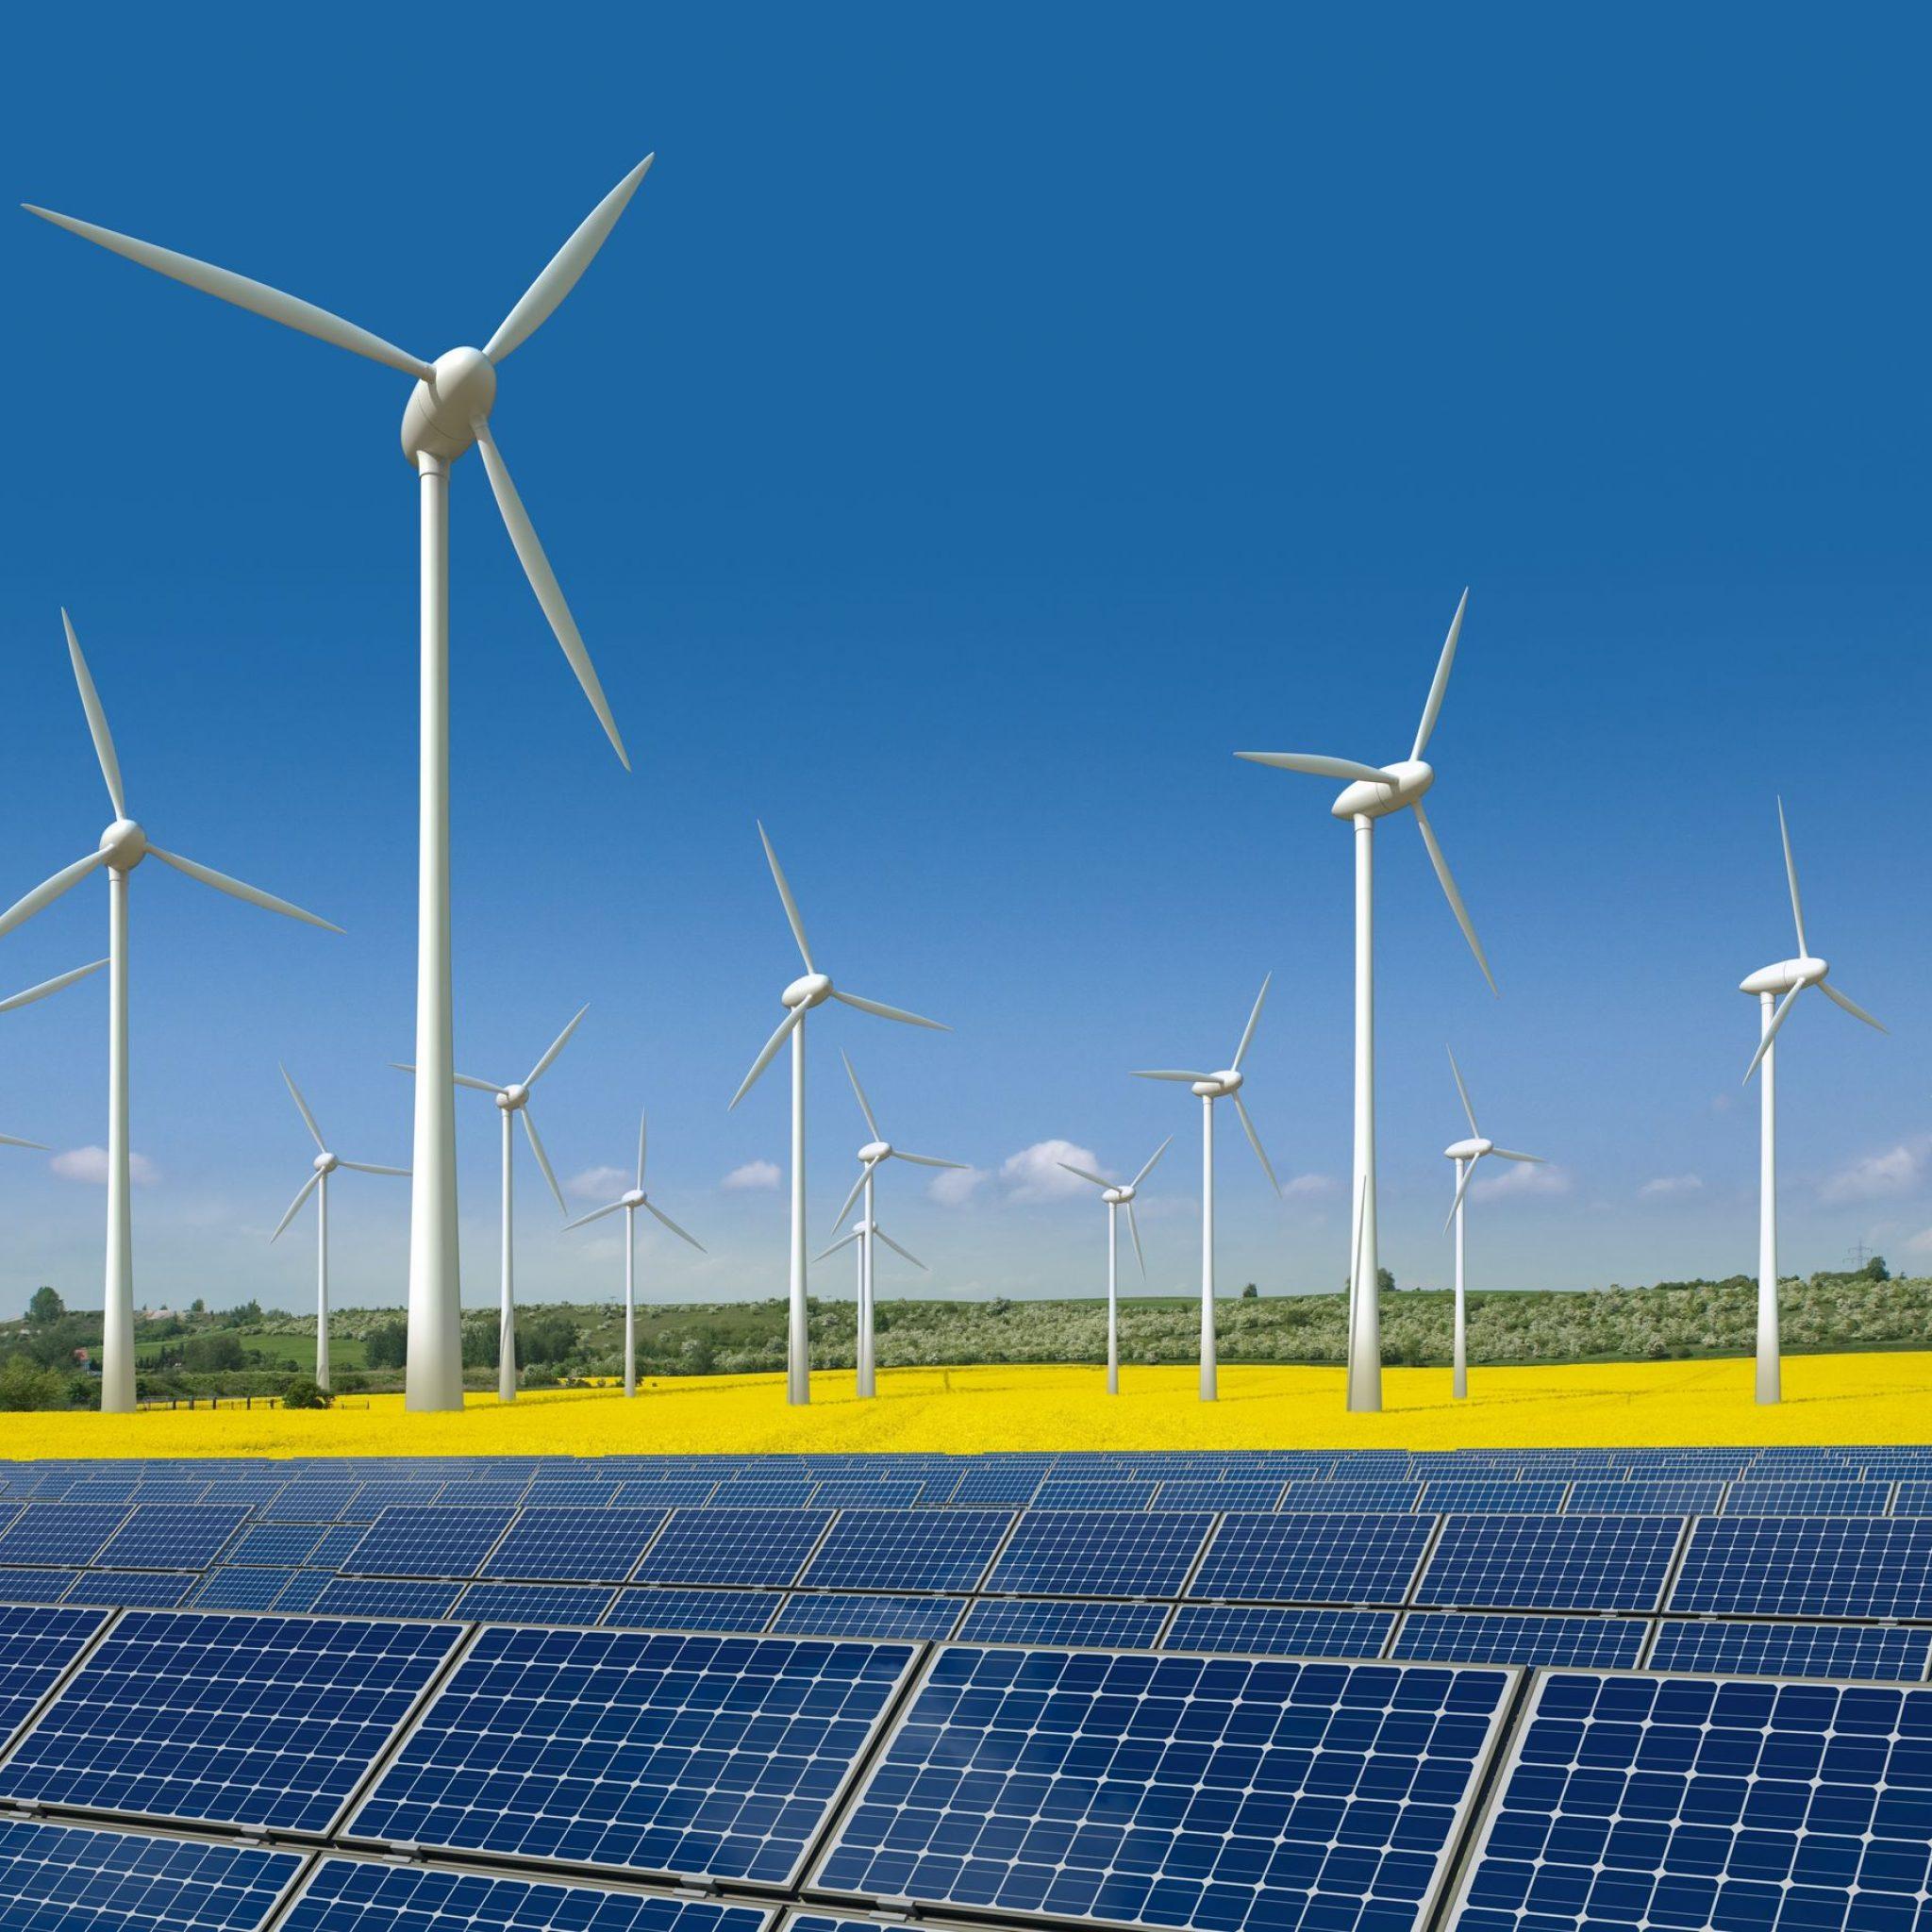 Case study GE uses PowerUp platform to optimize wind farm